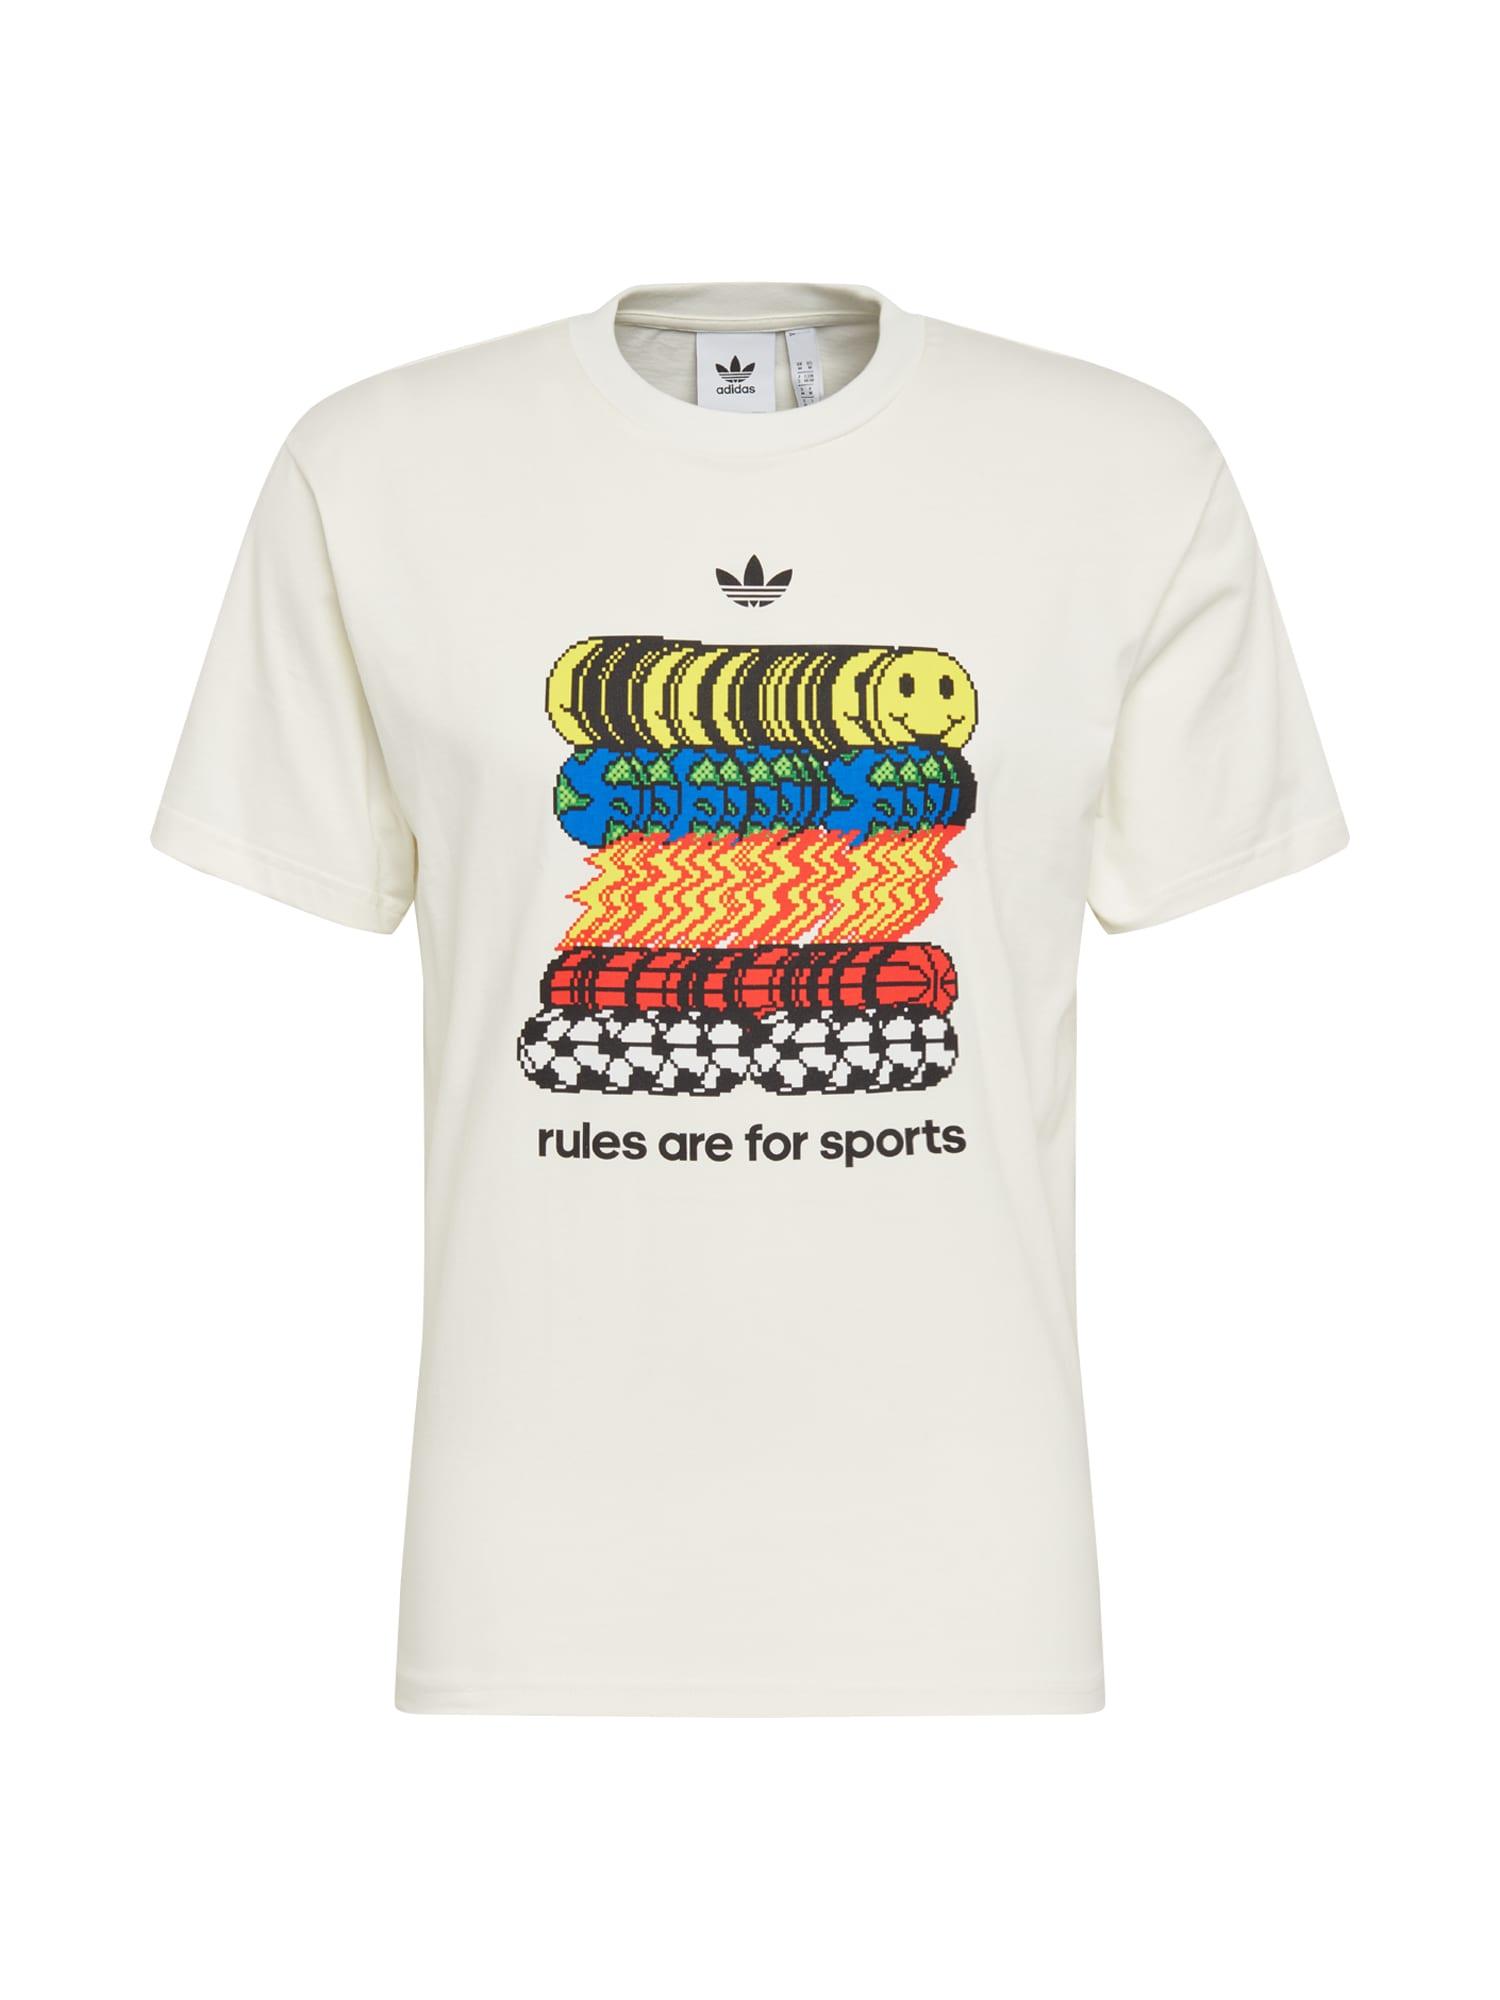 ADIDAS ORIGINALS Marškinėliai 'SPORTSRULE TEE' balta